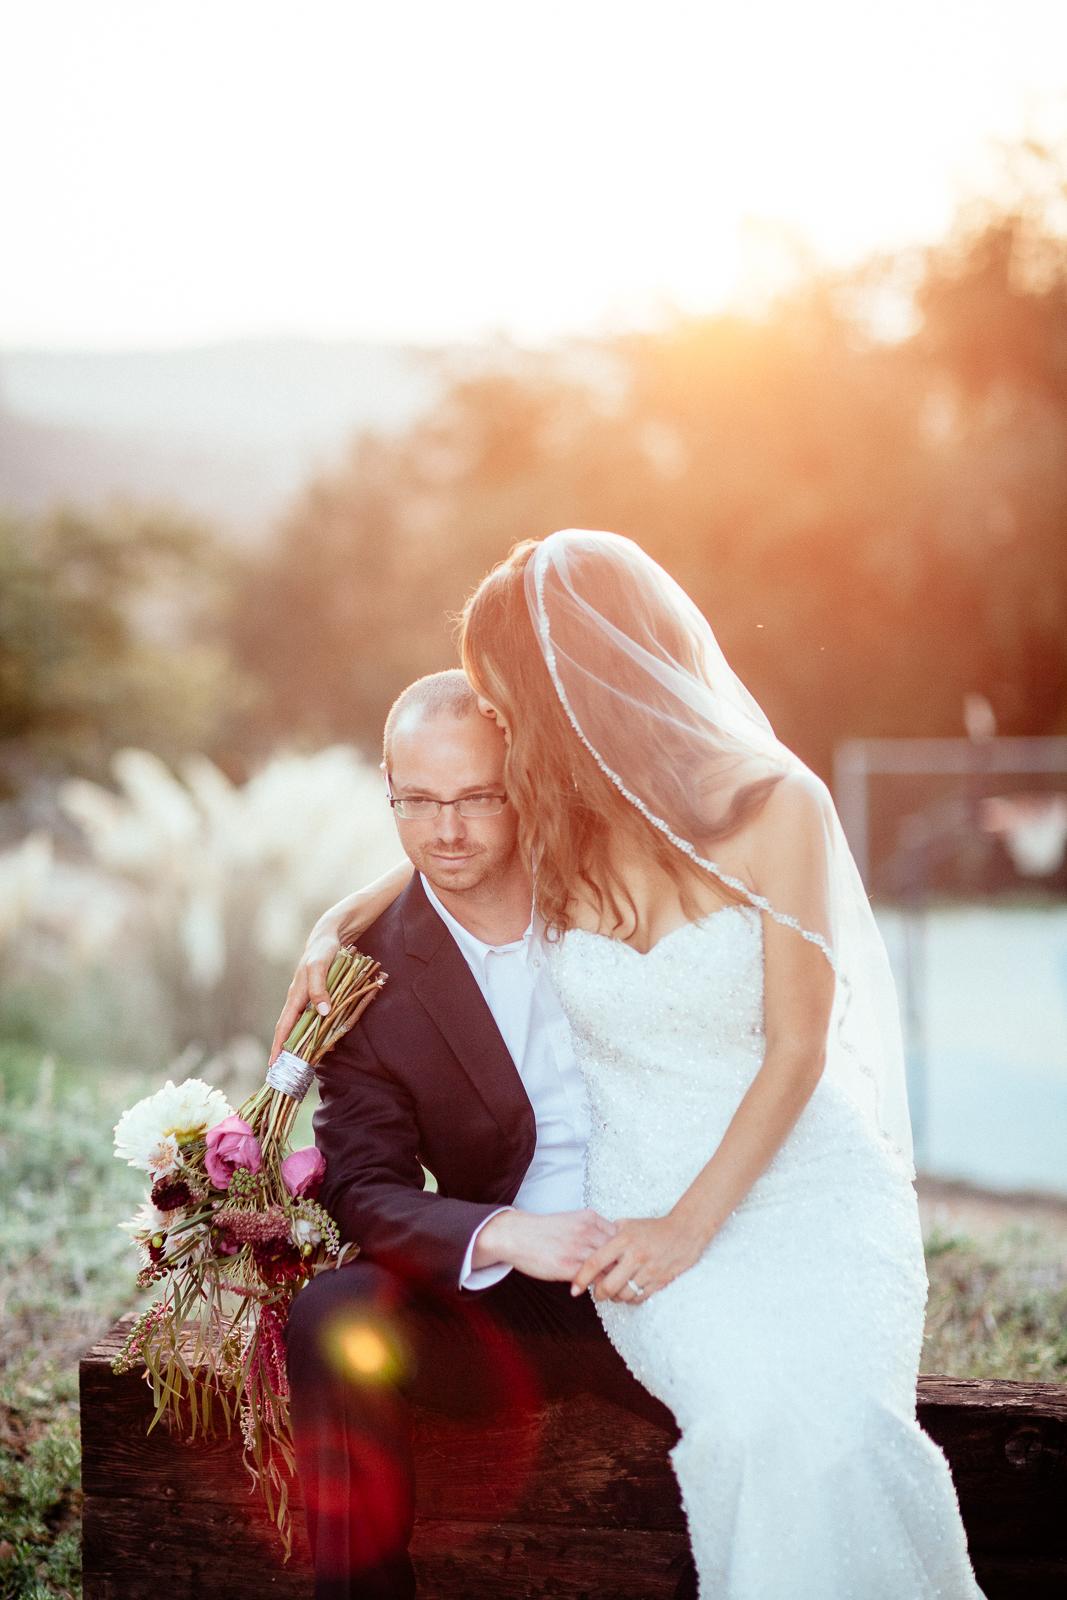 TORI_&_ALEX_WEDDING_2015_IMG_8553.JPG